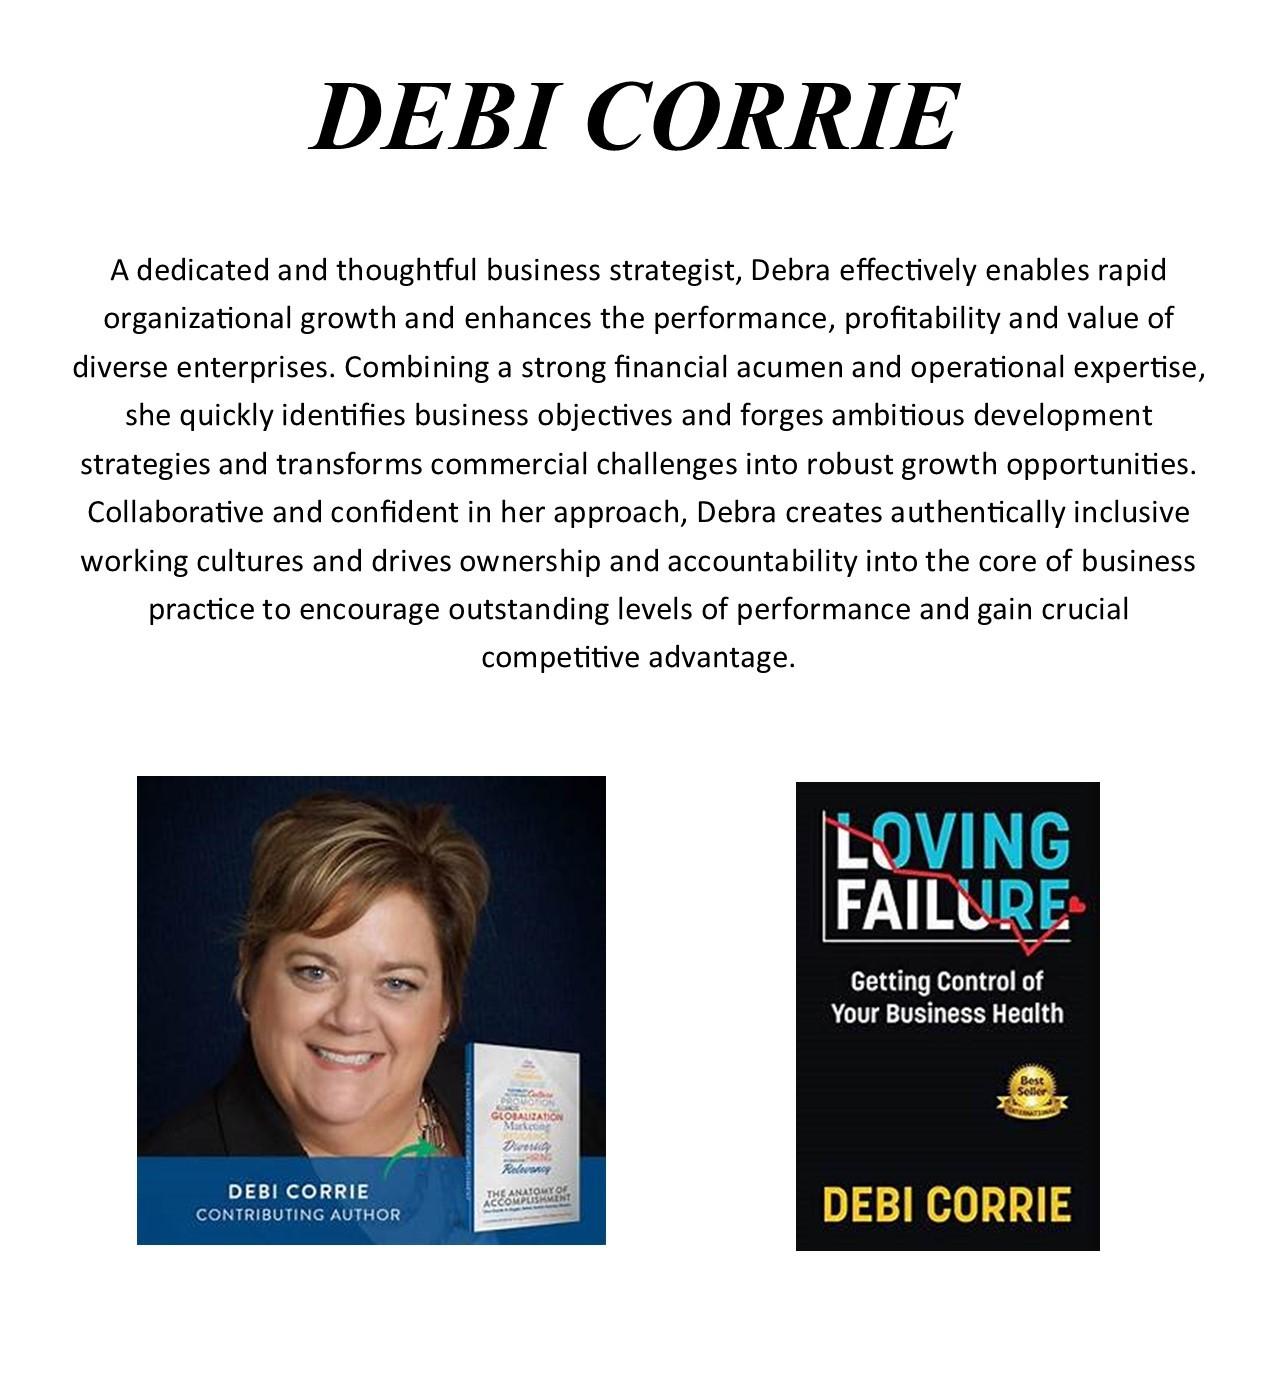 Bio - Debi Corrie